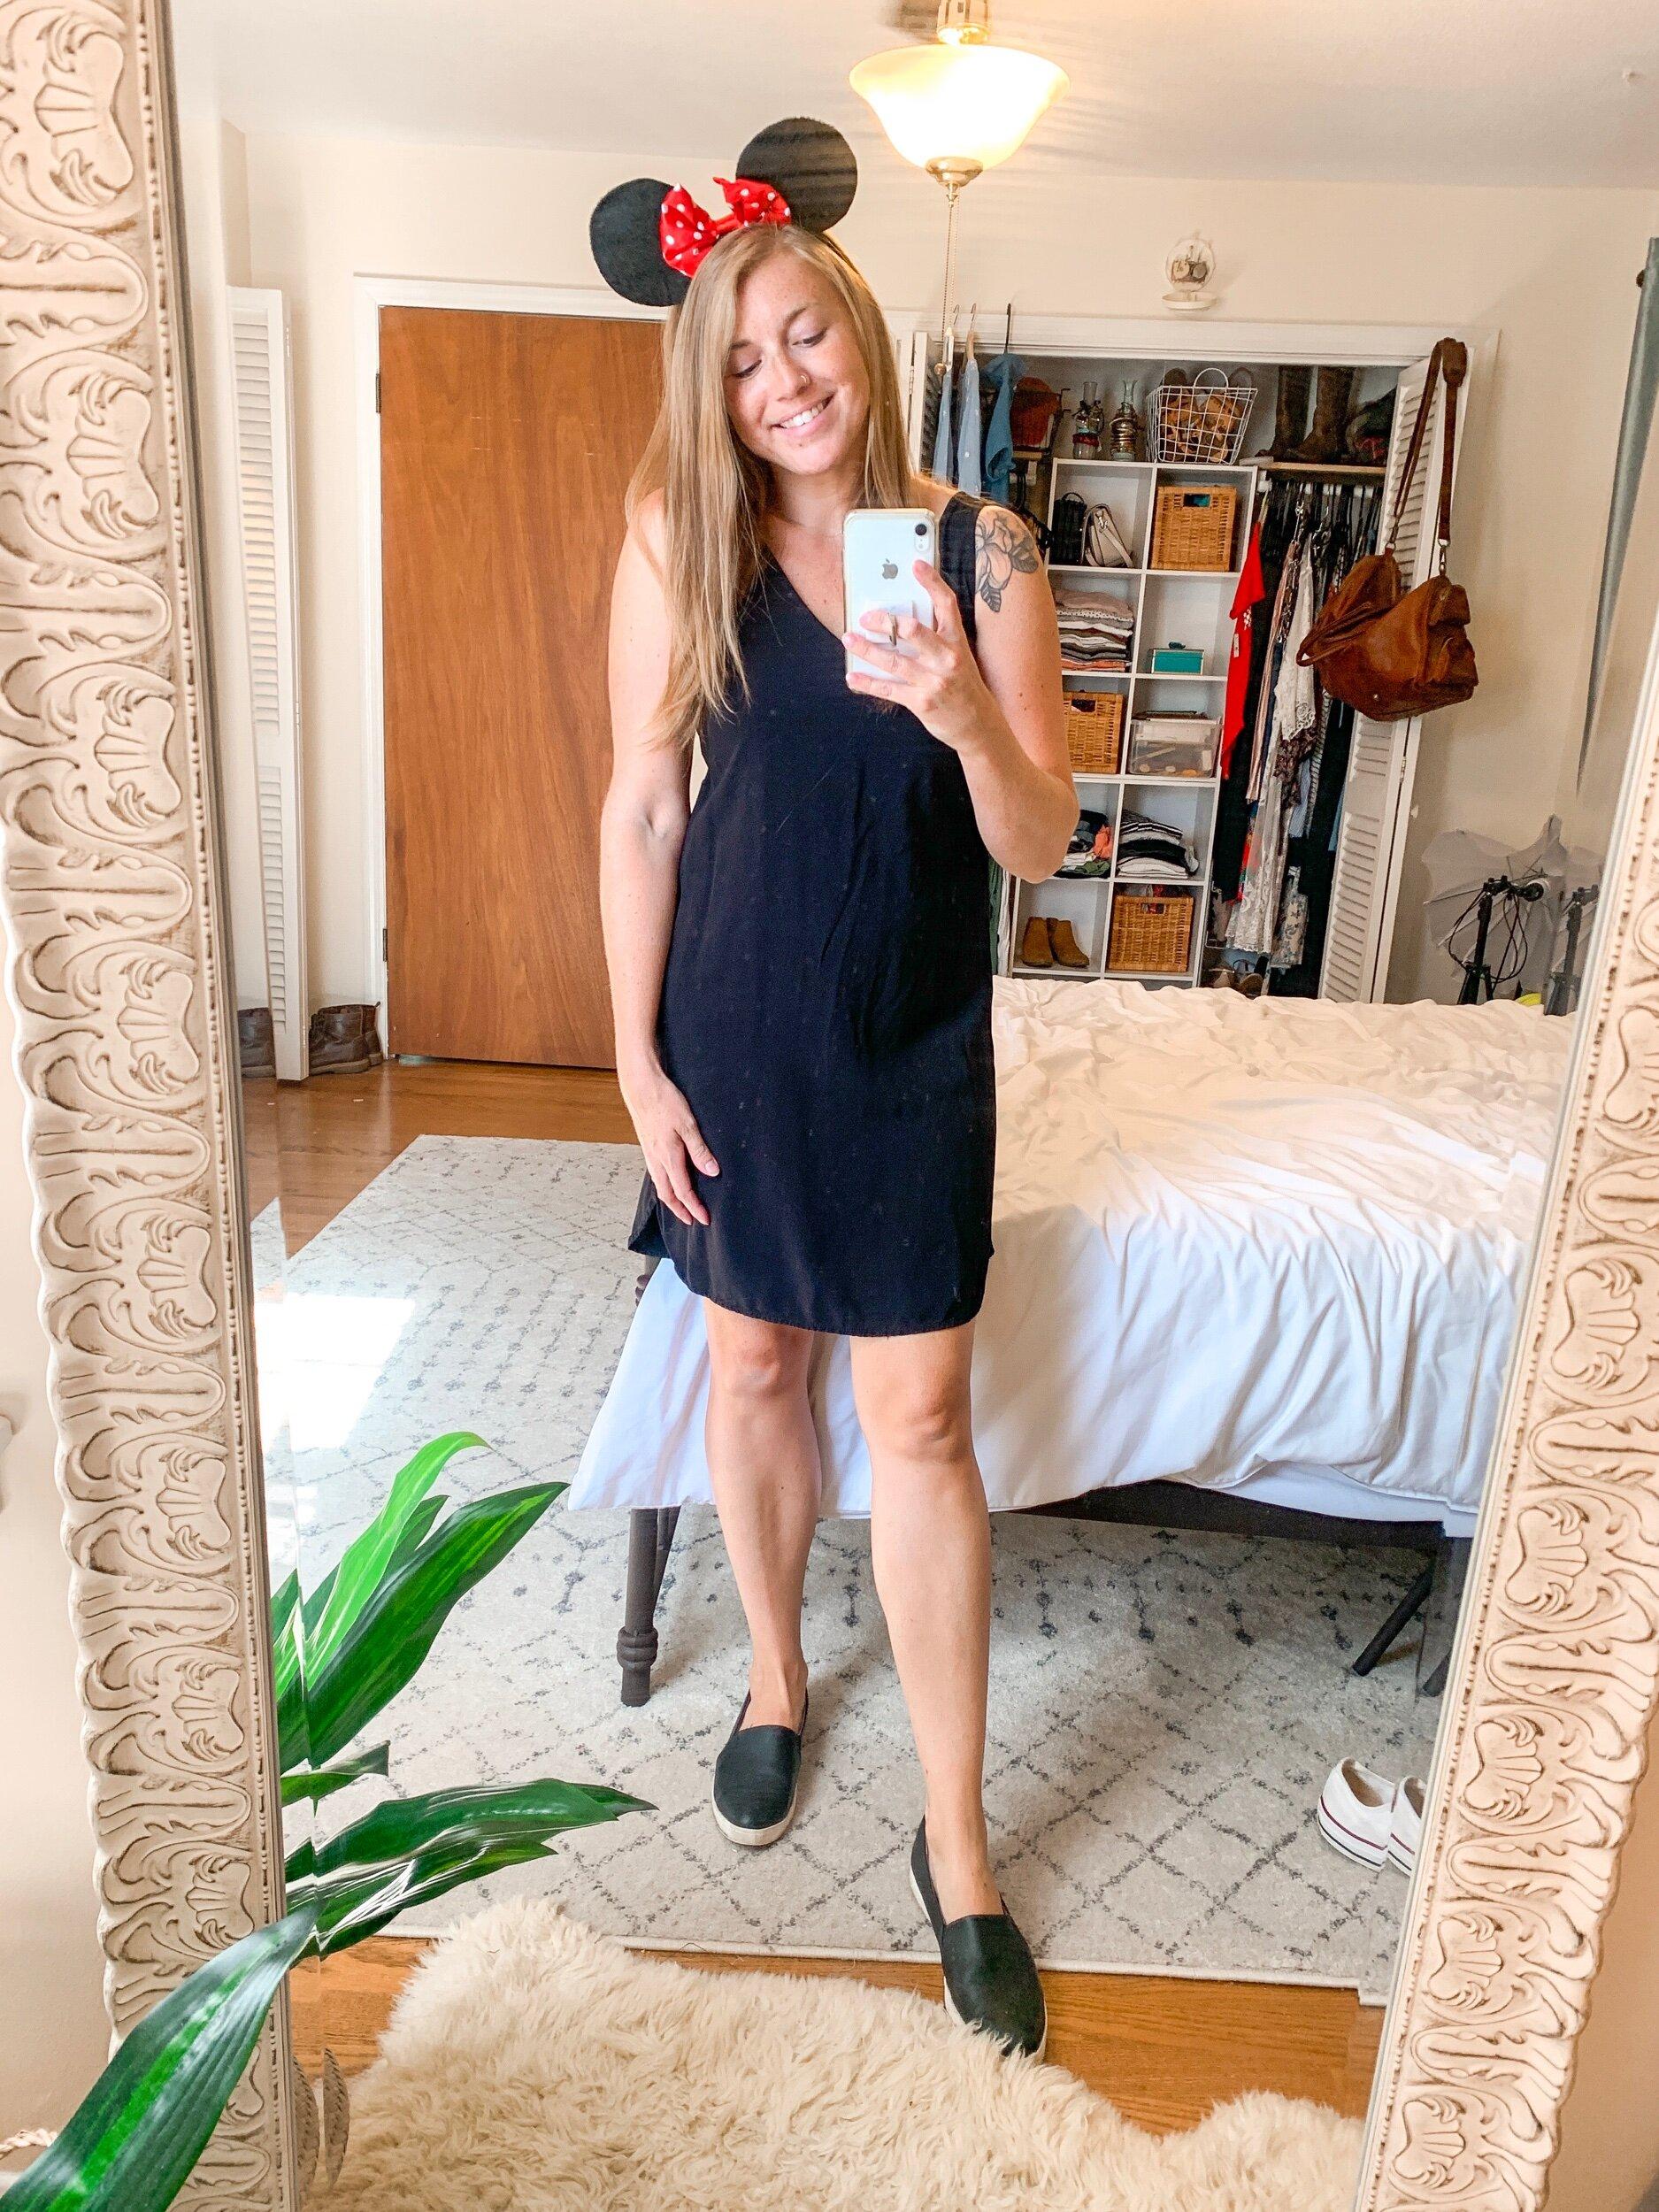 Basic Dress  //  Slide on Sneakers  //  Minnie Ears